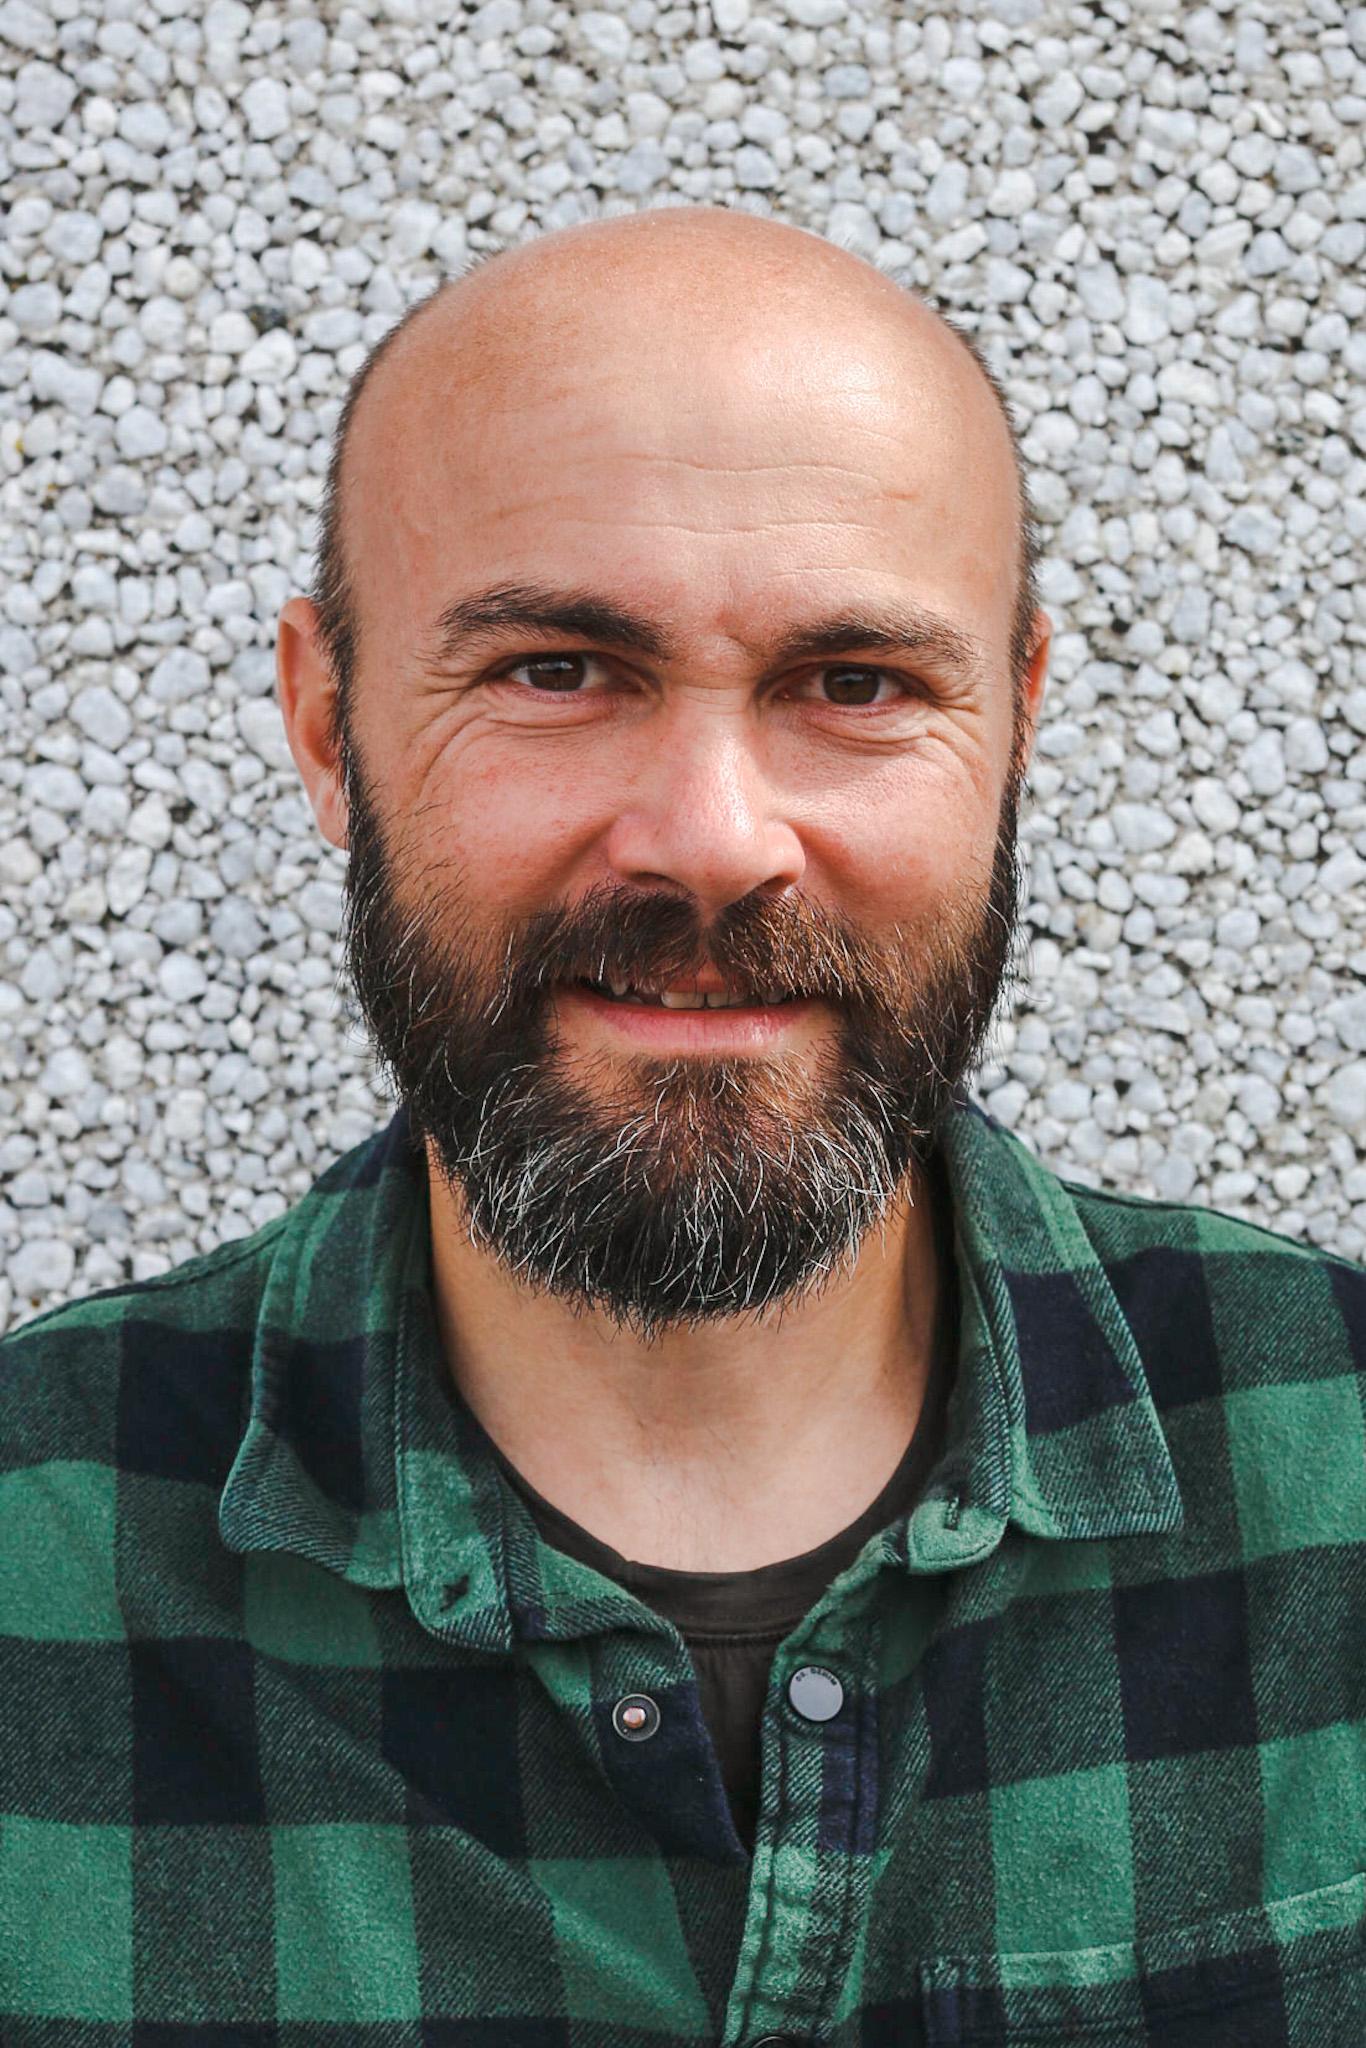 Allan Fagerlund